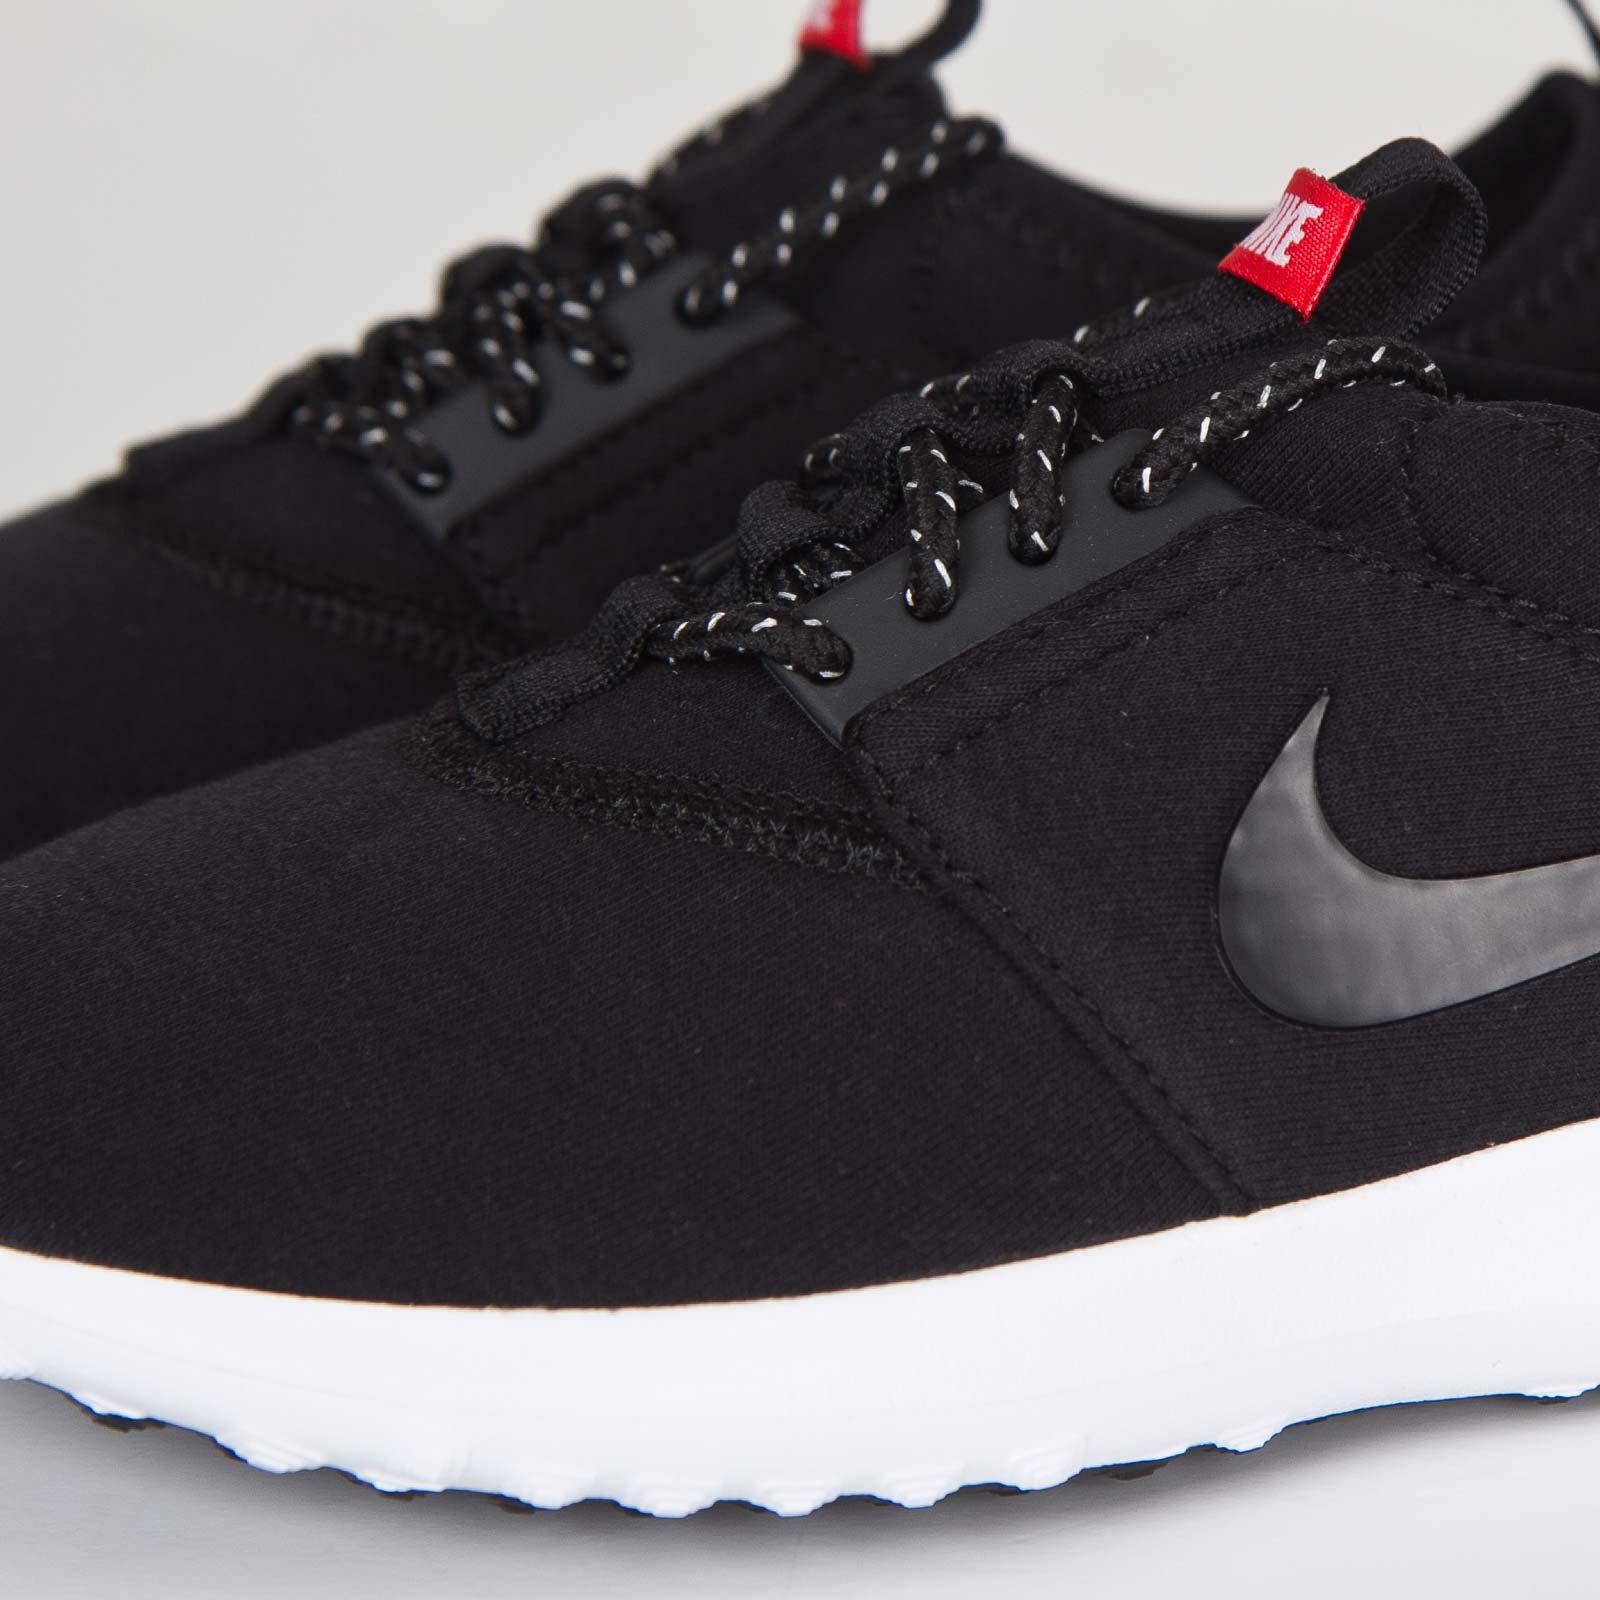 Nike Wmns Juvenate TP 749551 002 Sneakersnstuff